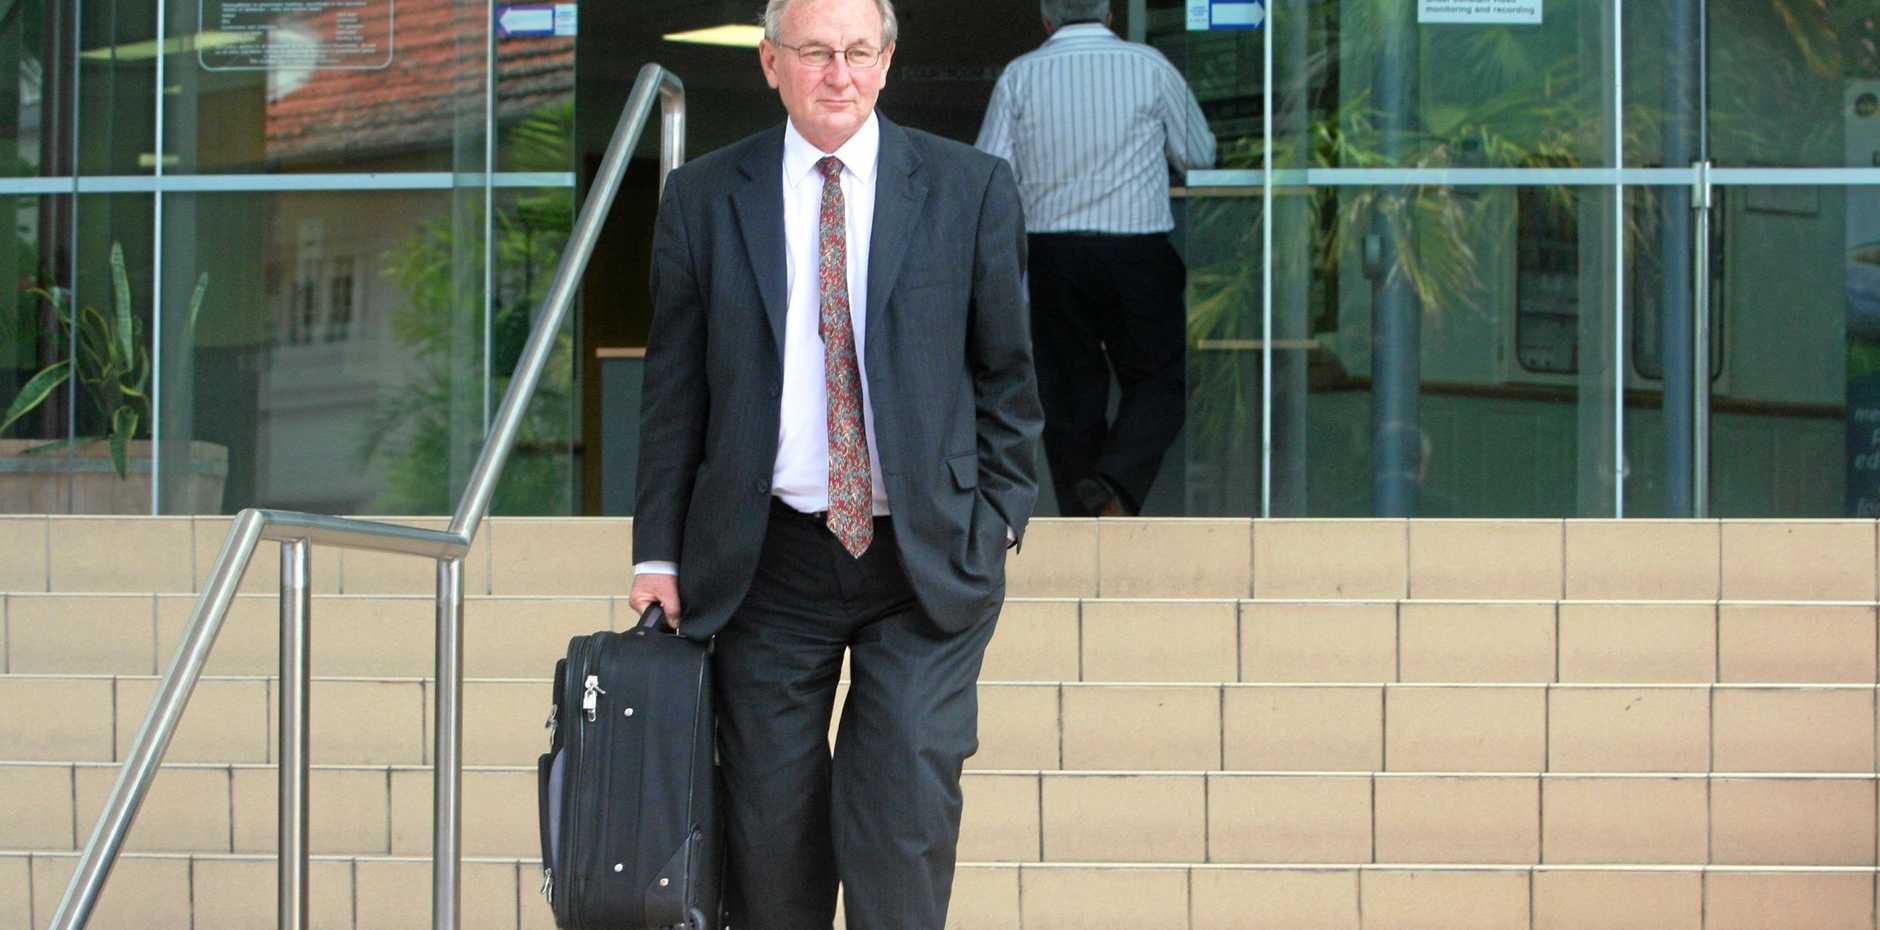 HIGH-PROFILE criminal lawyer Doug Winning leaving the Rockhampton Court House.